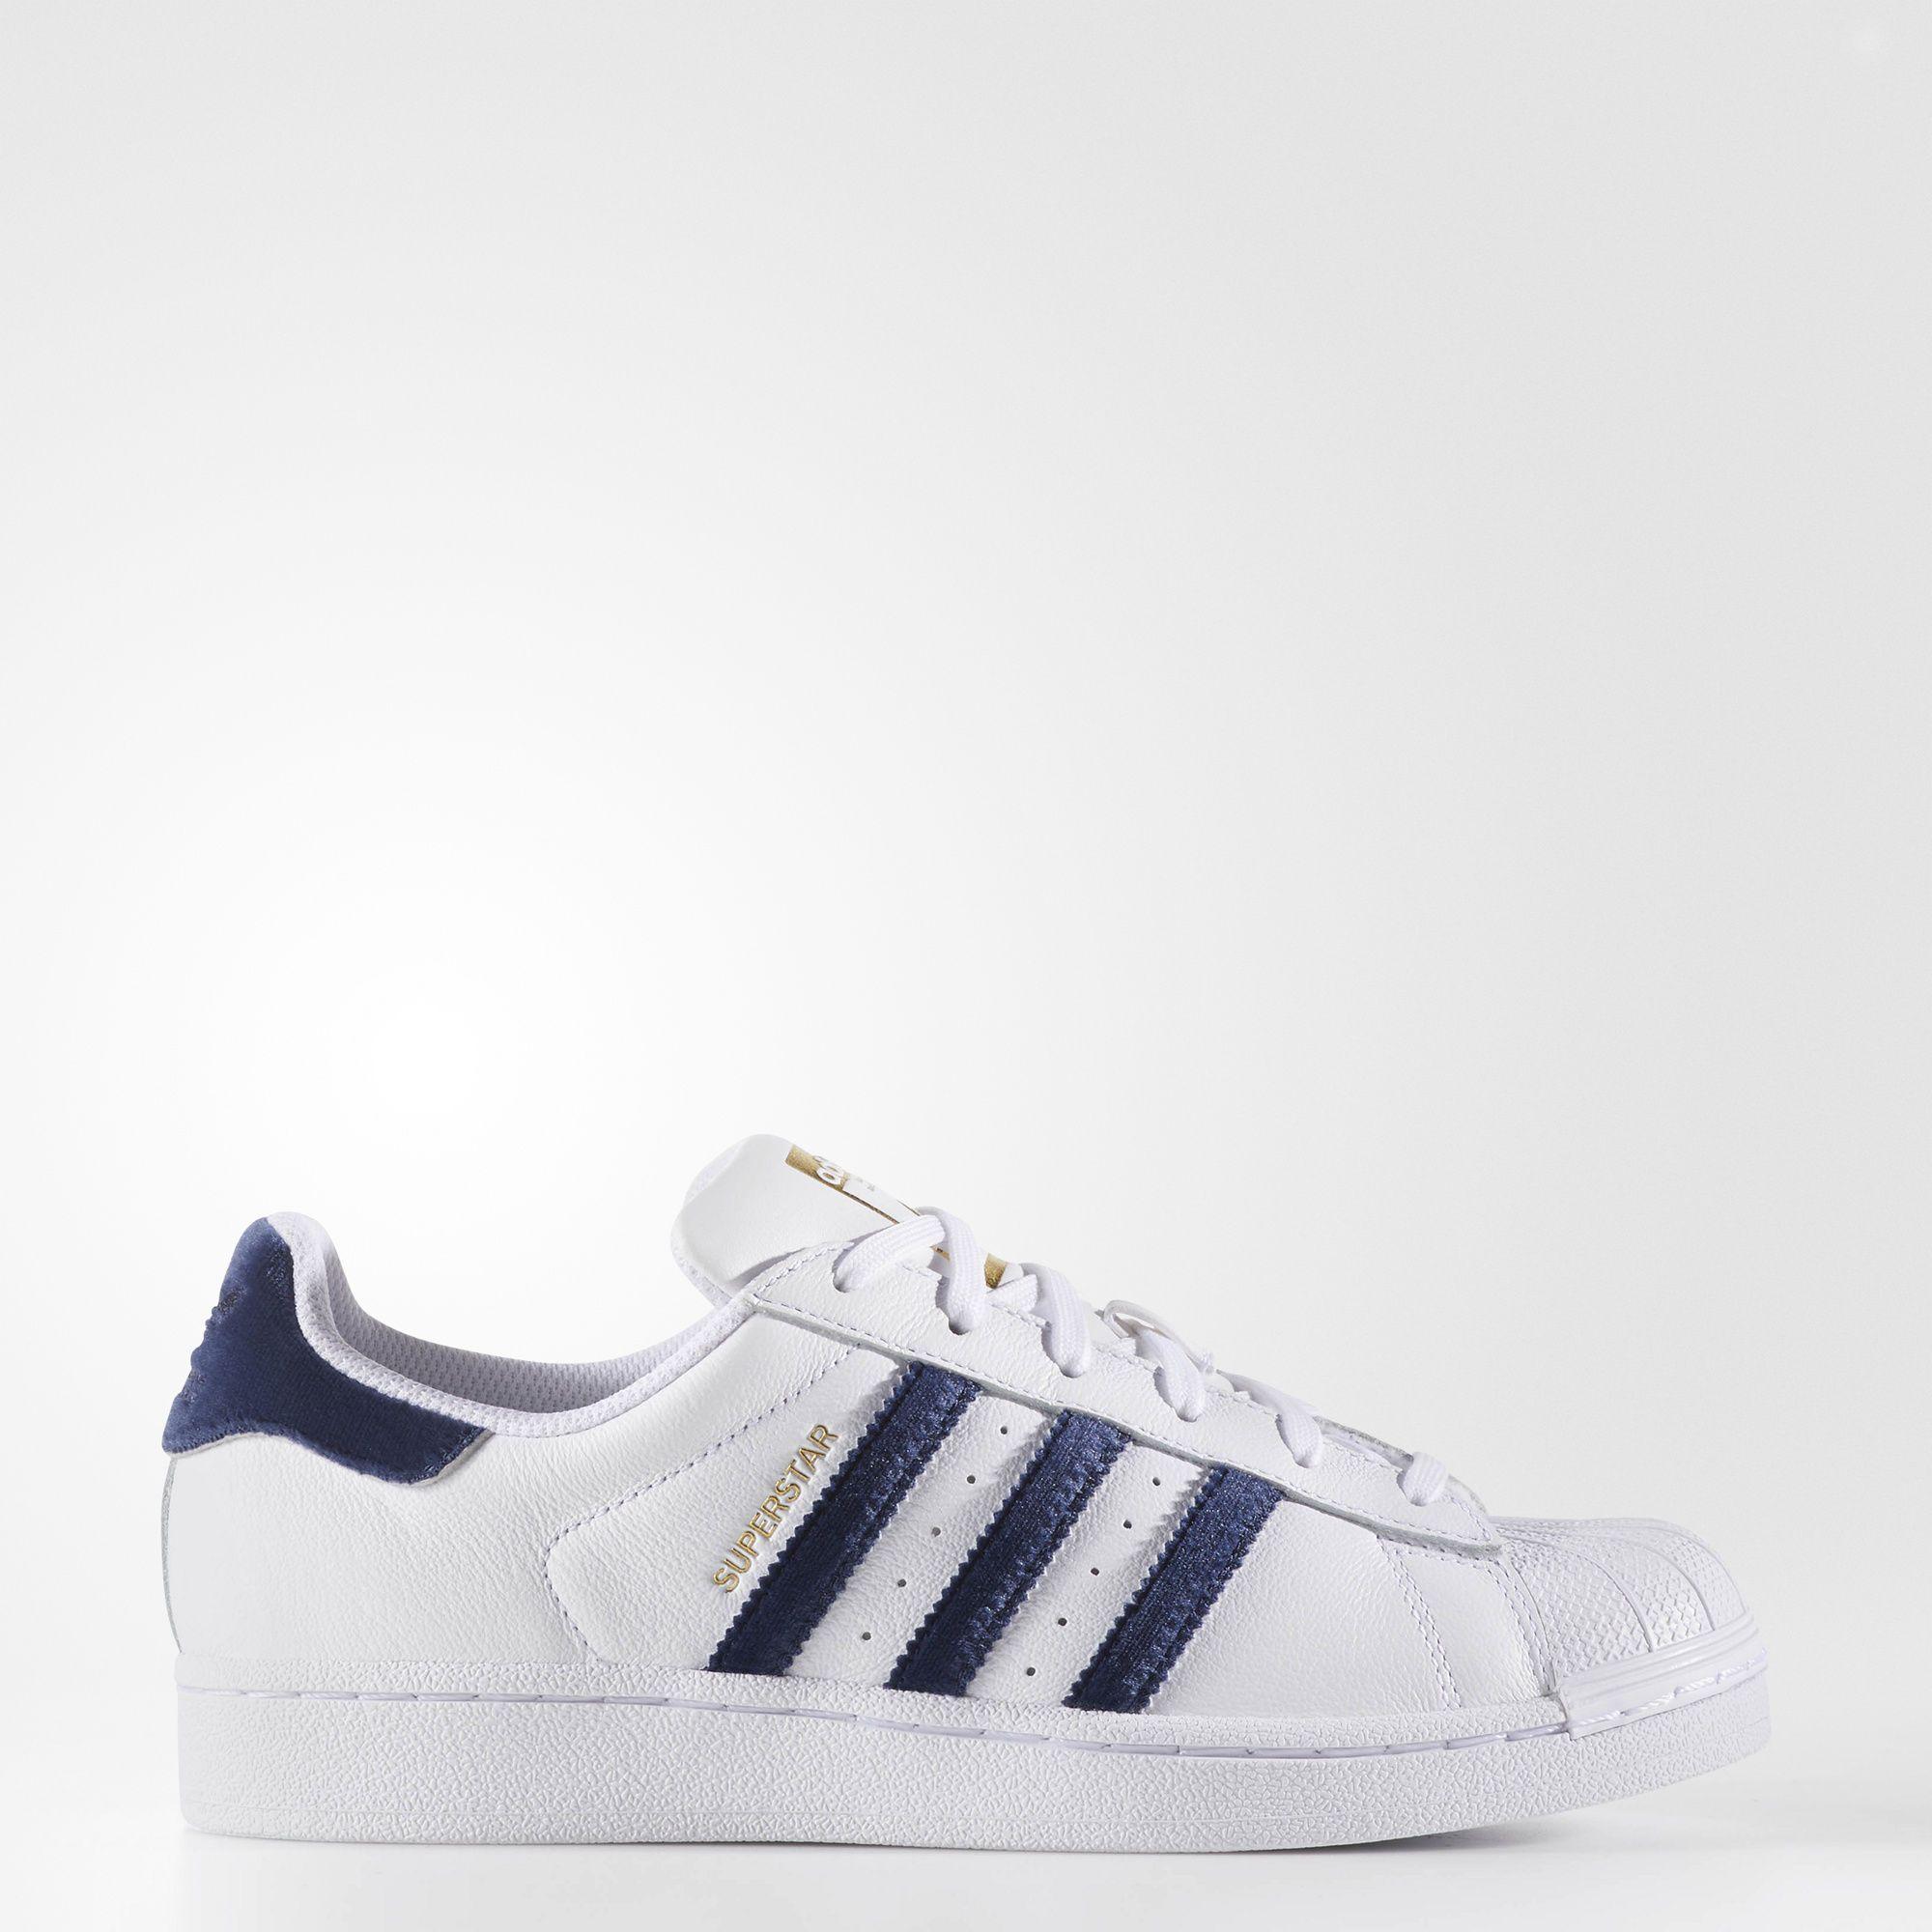 l'adidas superstar è stata una leggenda per streetwear scarpa